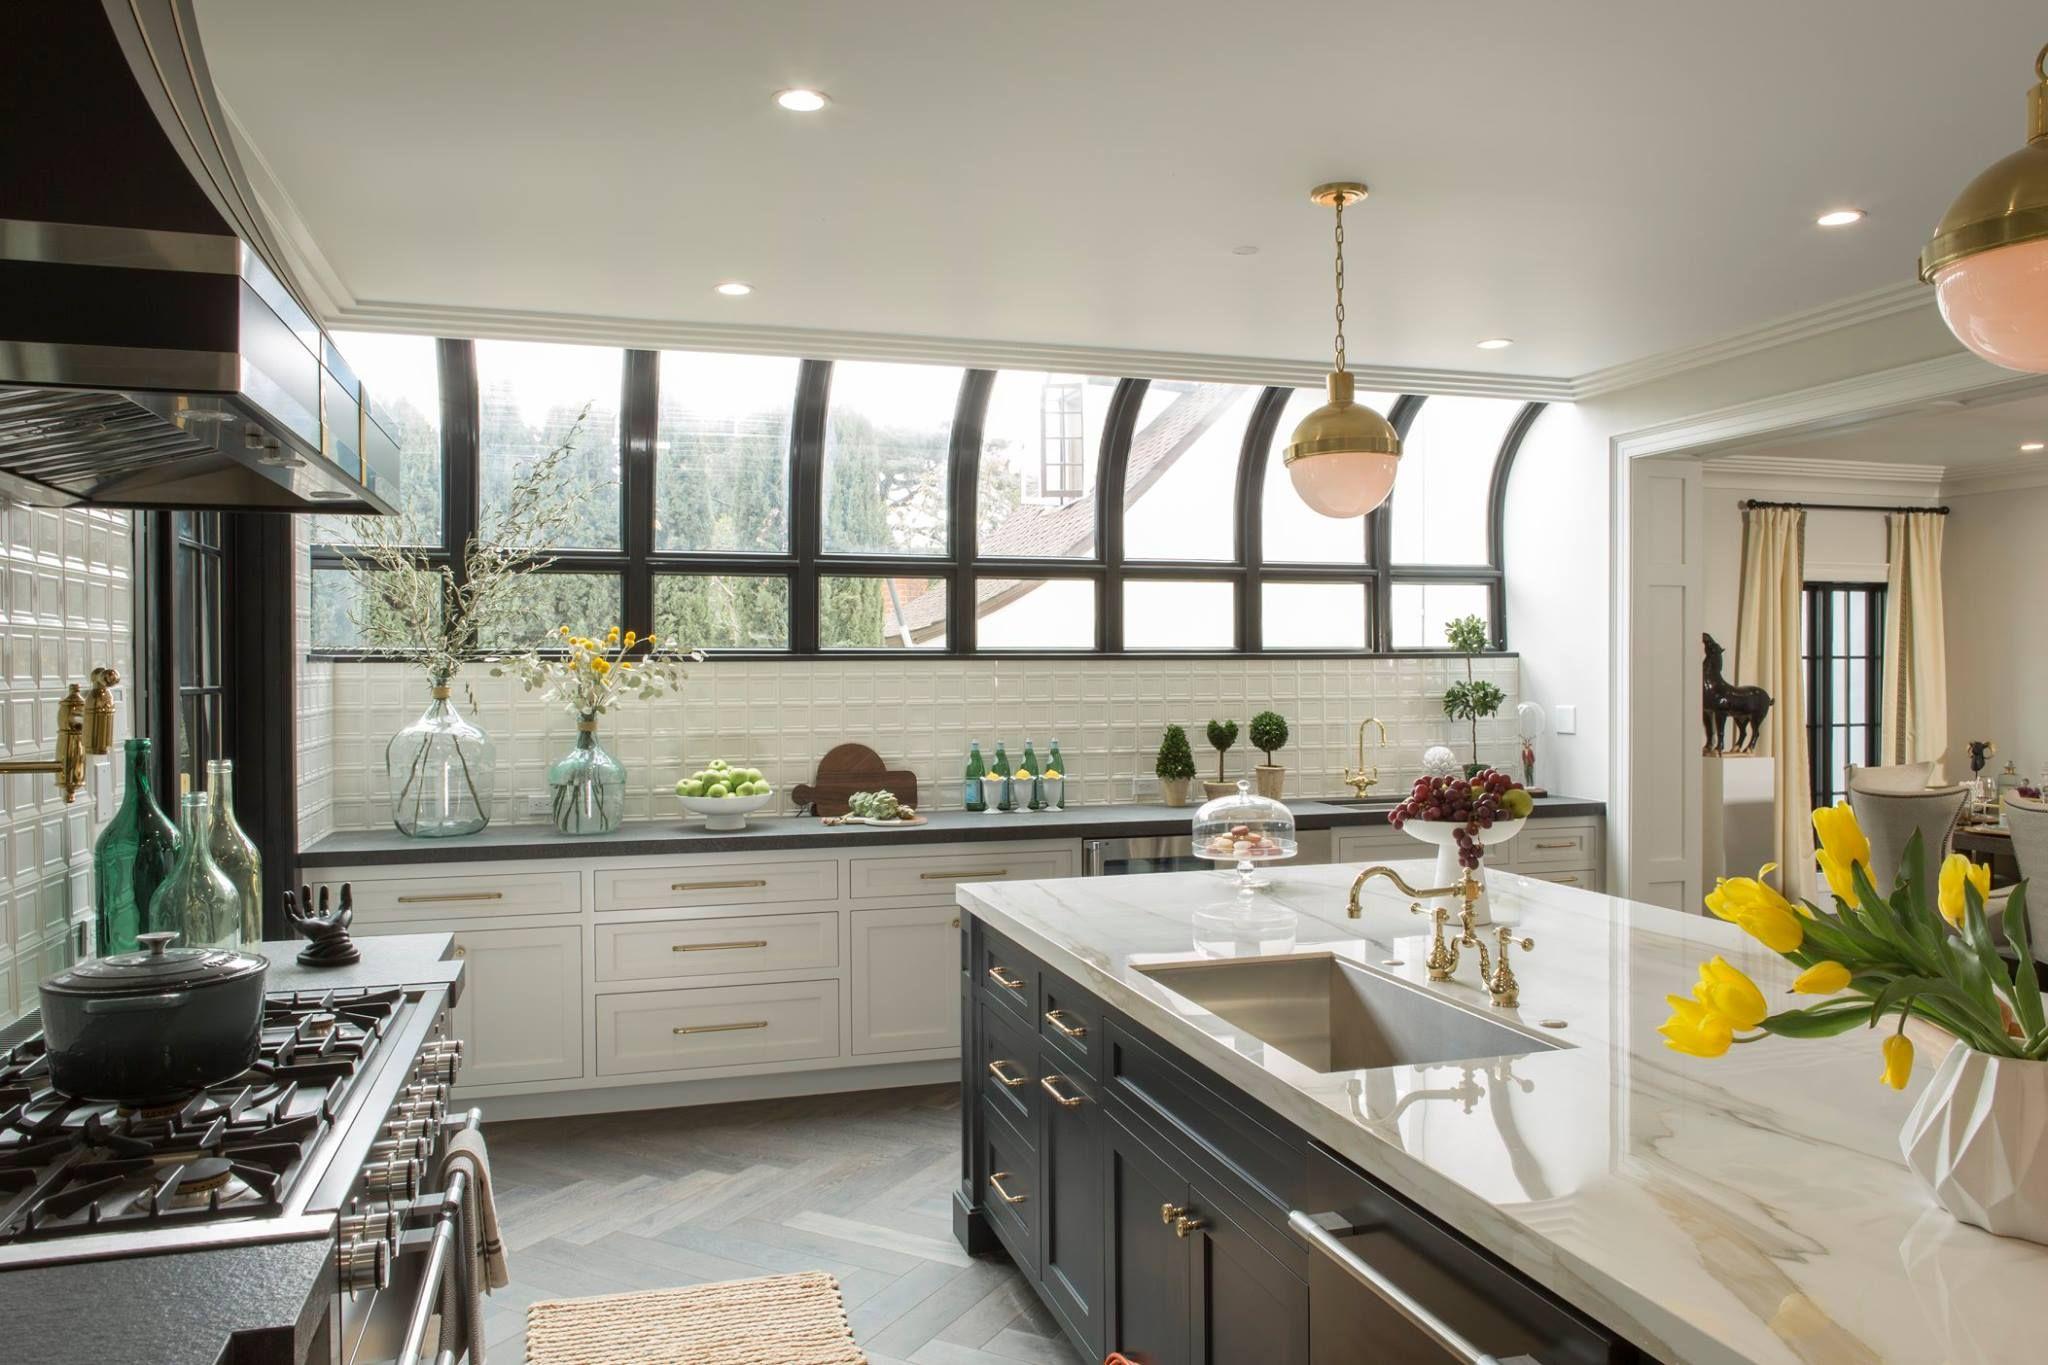 Drew S Honeymoon House Kitchen Solarium Window Property Brothers Kitchen Home Kitchens Honeymoon House